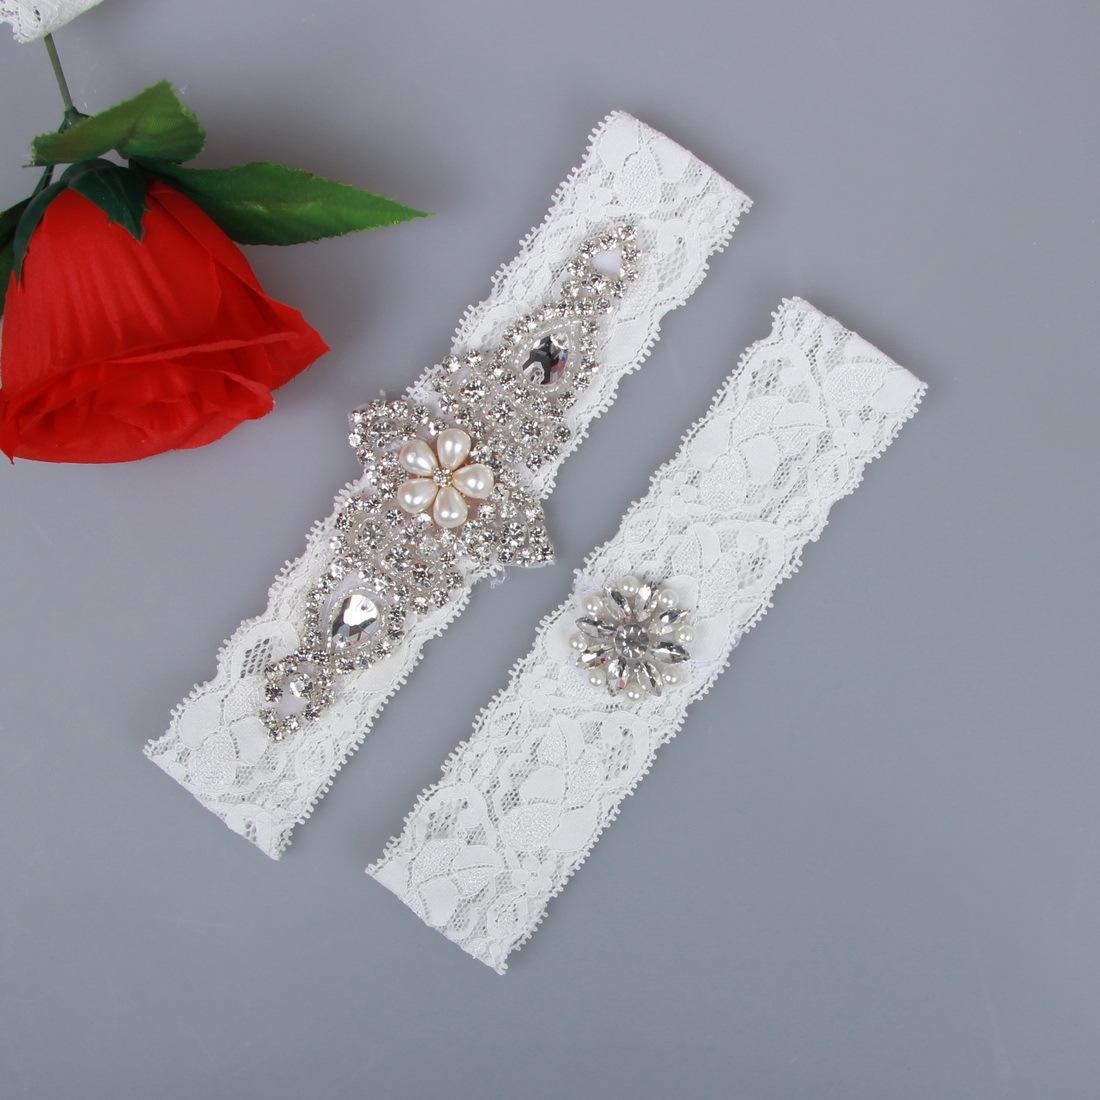 Sexy Bridal Garters Lace Rhinestones Pearls Vintage Handmade Wedding Garter Set With Bridal Leg Garter Belt Beads Plus Size